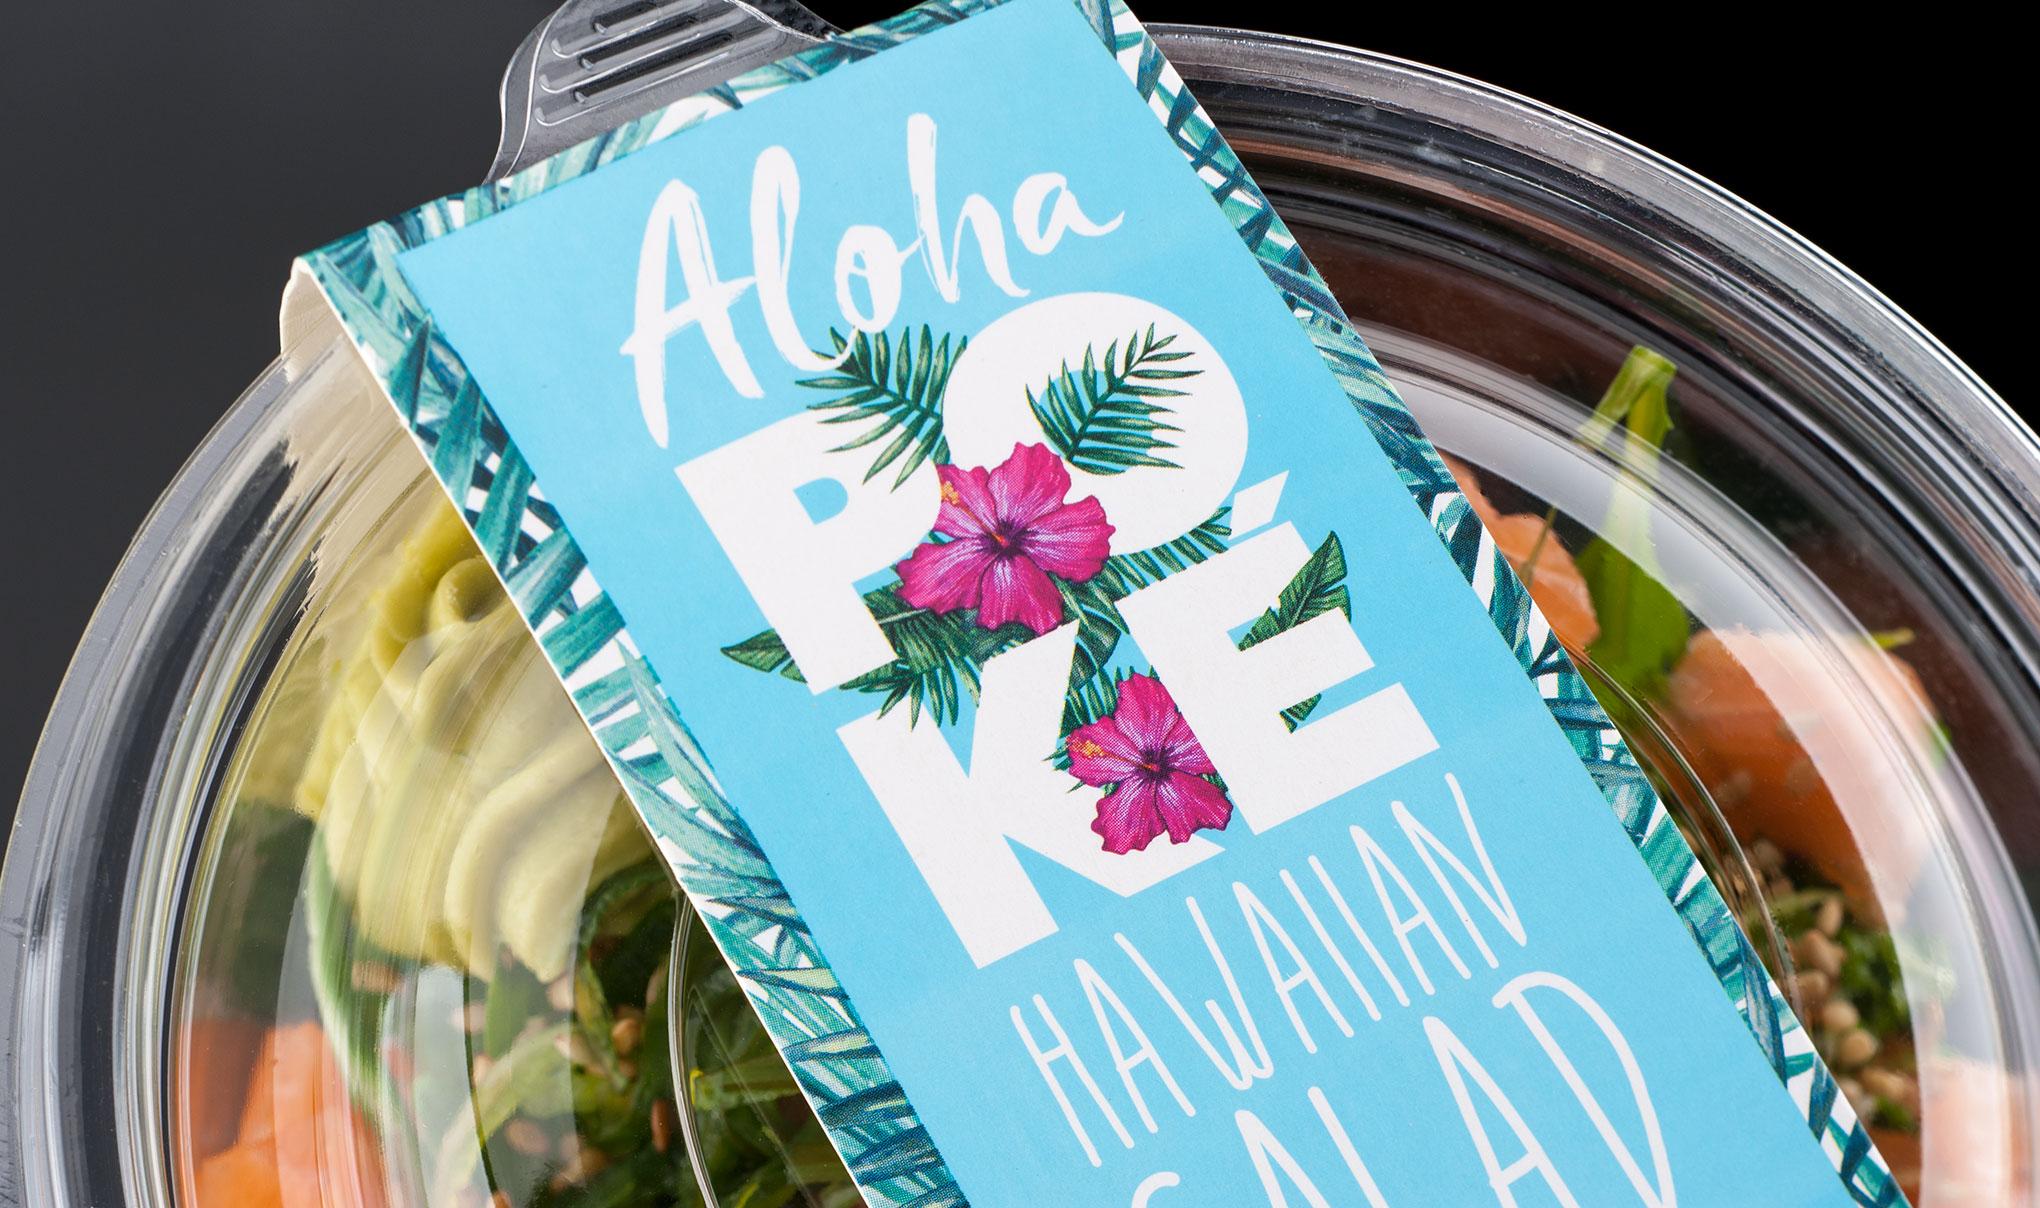 Waitress Aloha Poké Salmon Bowl